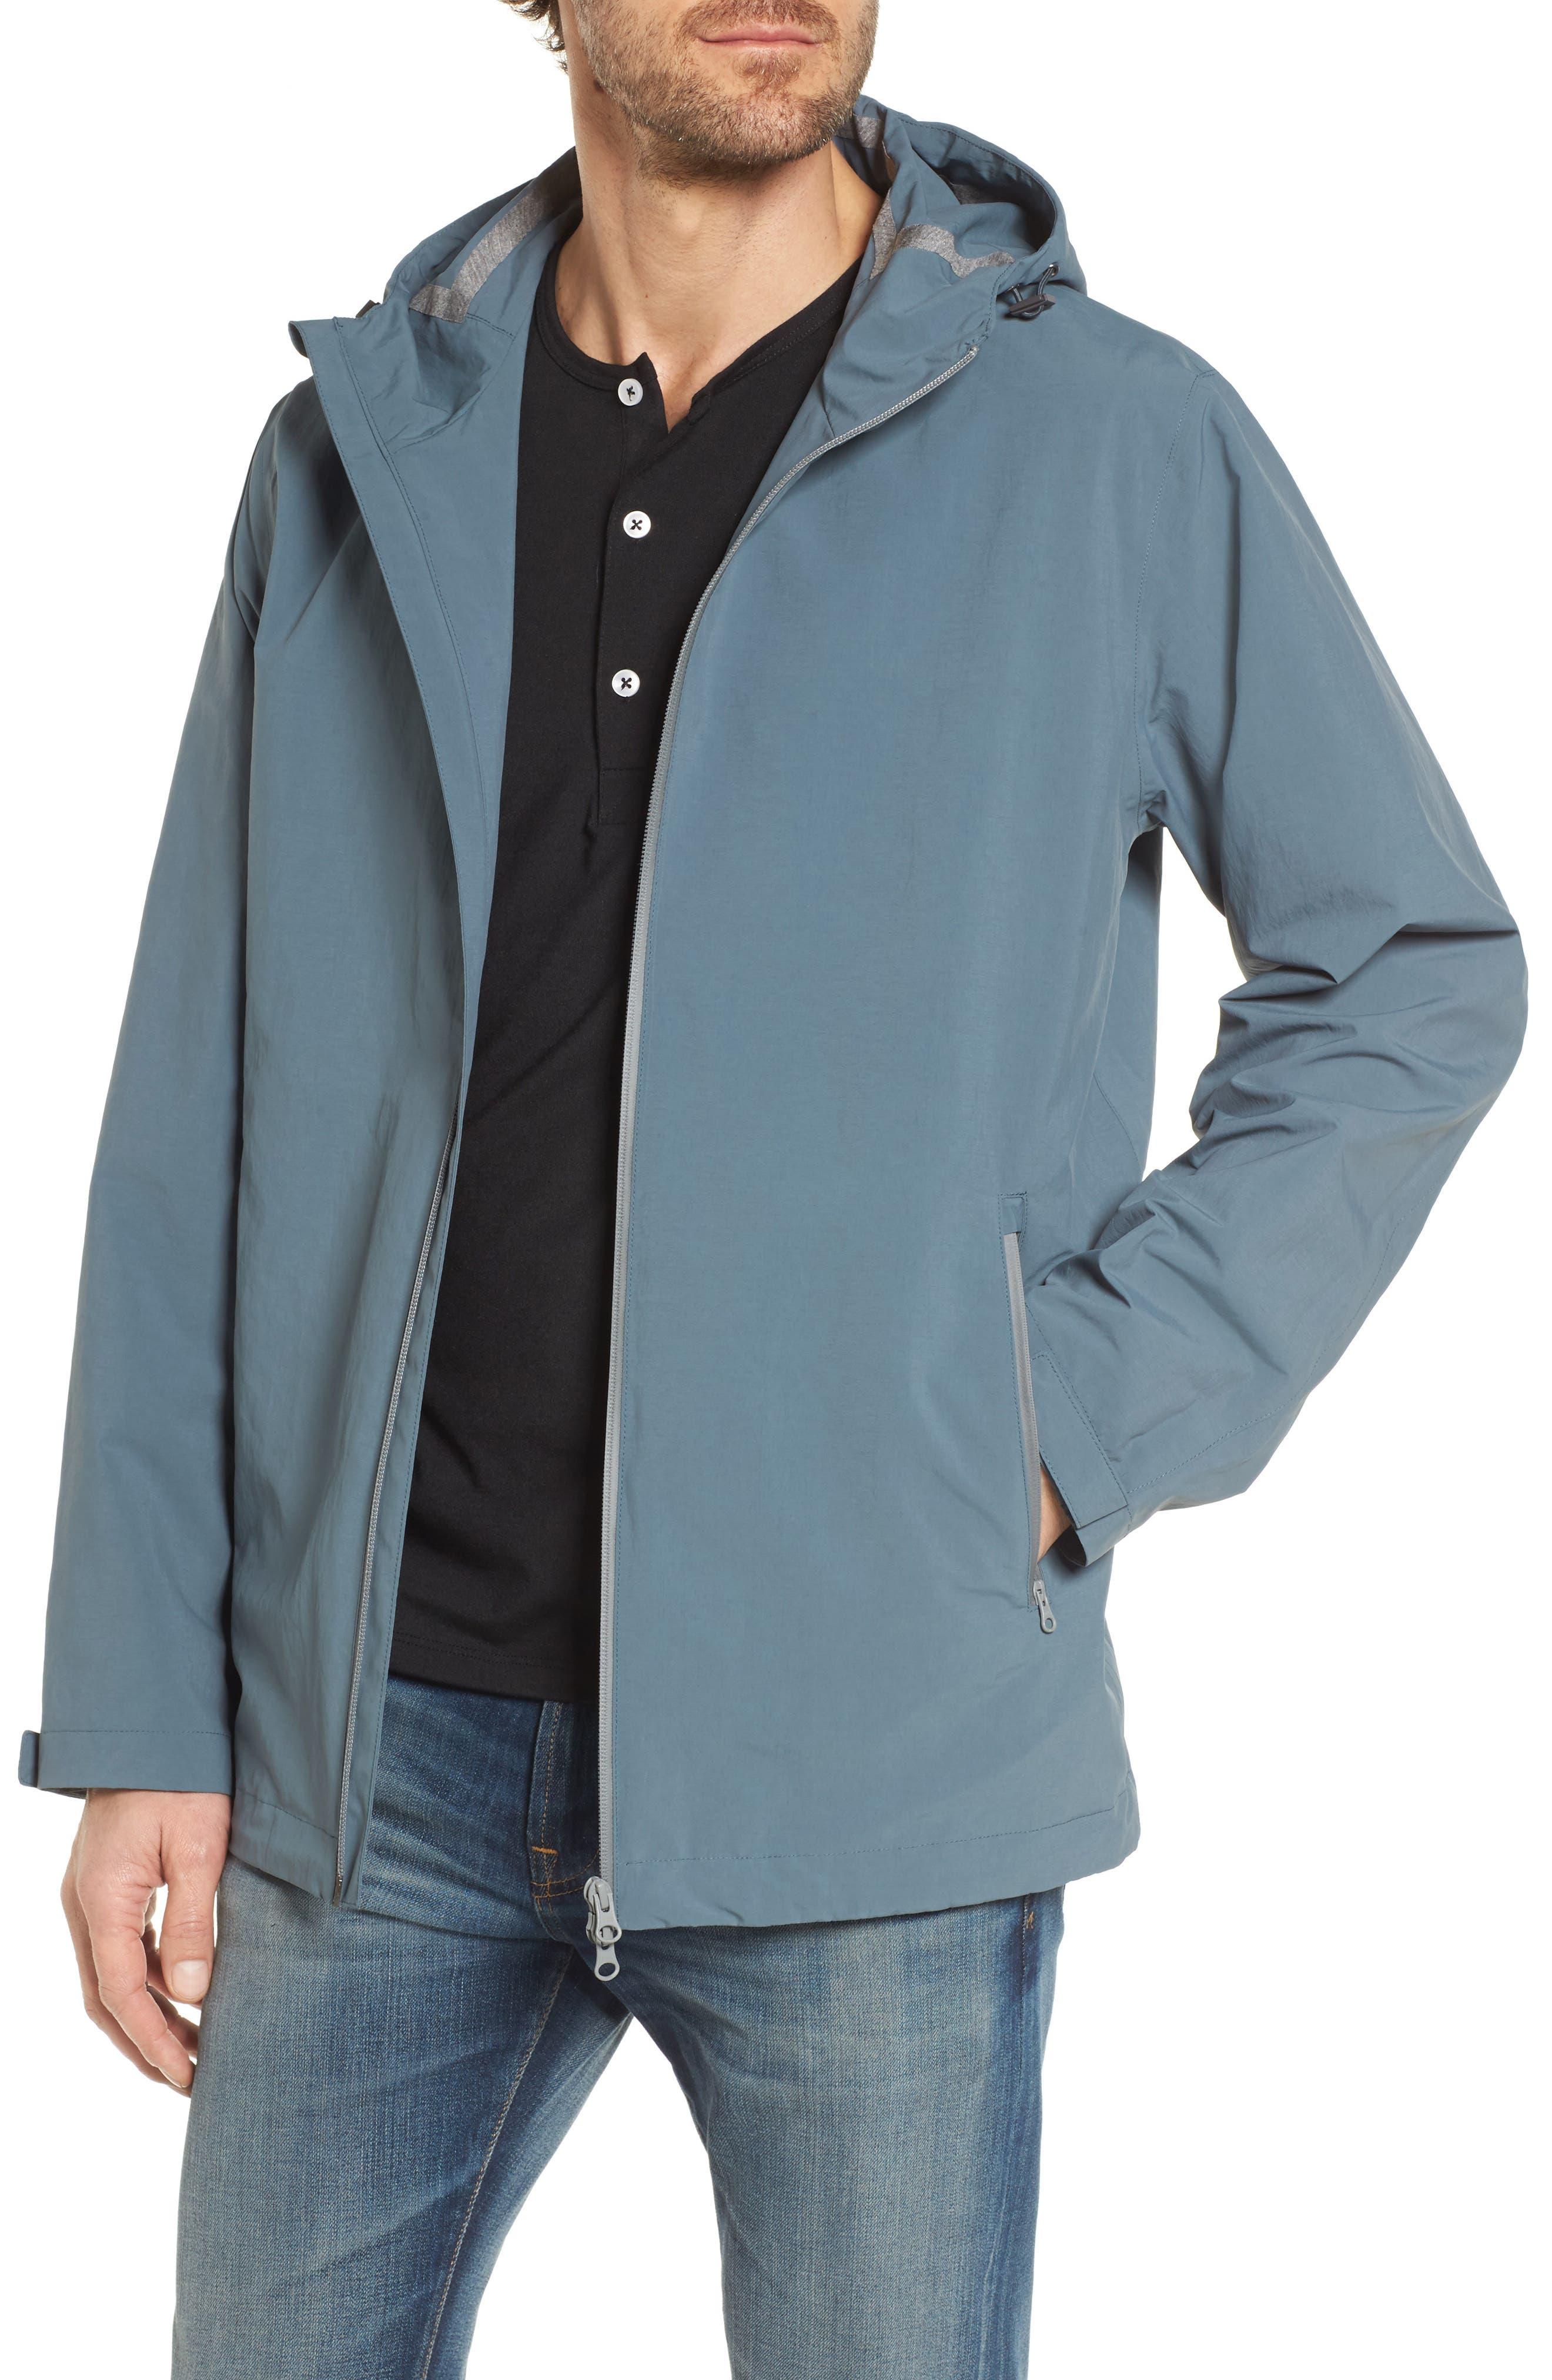 Plaster Hooded Raincoat,                             Main thumbnail 1, color,                             Blue/ Grey